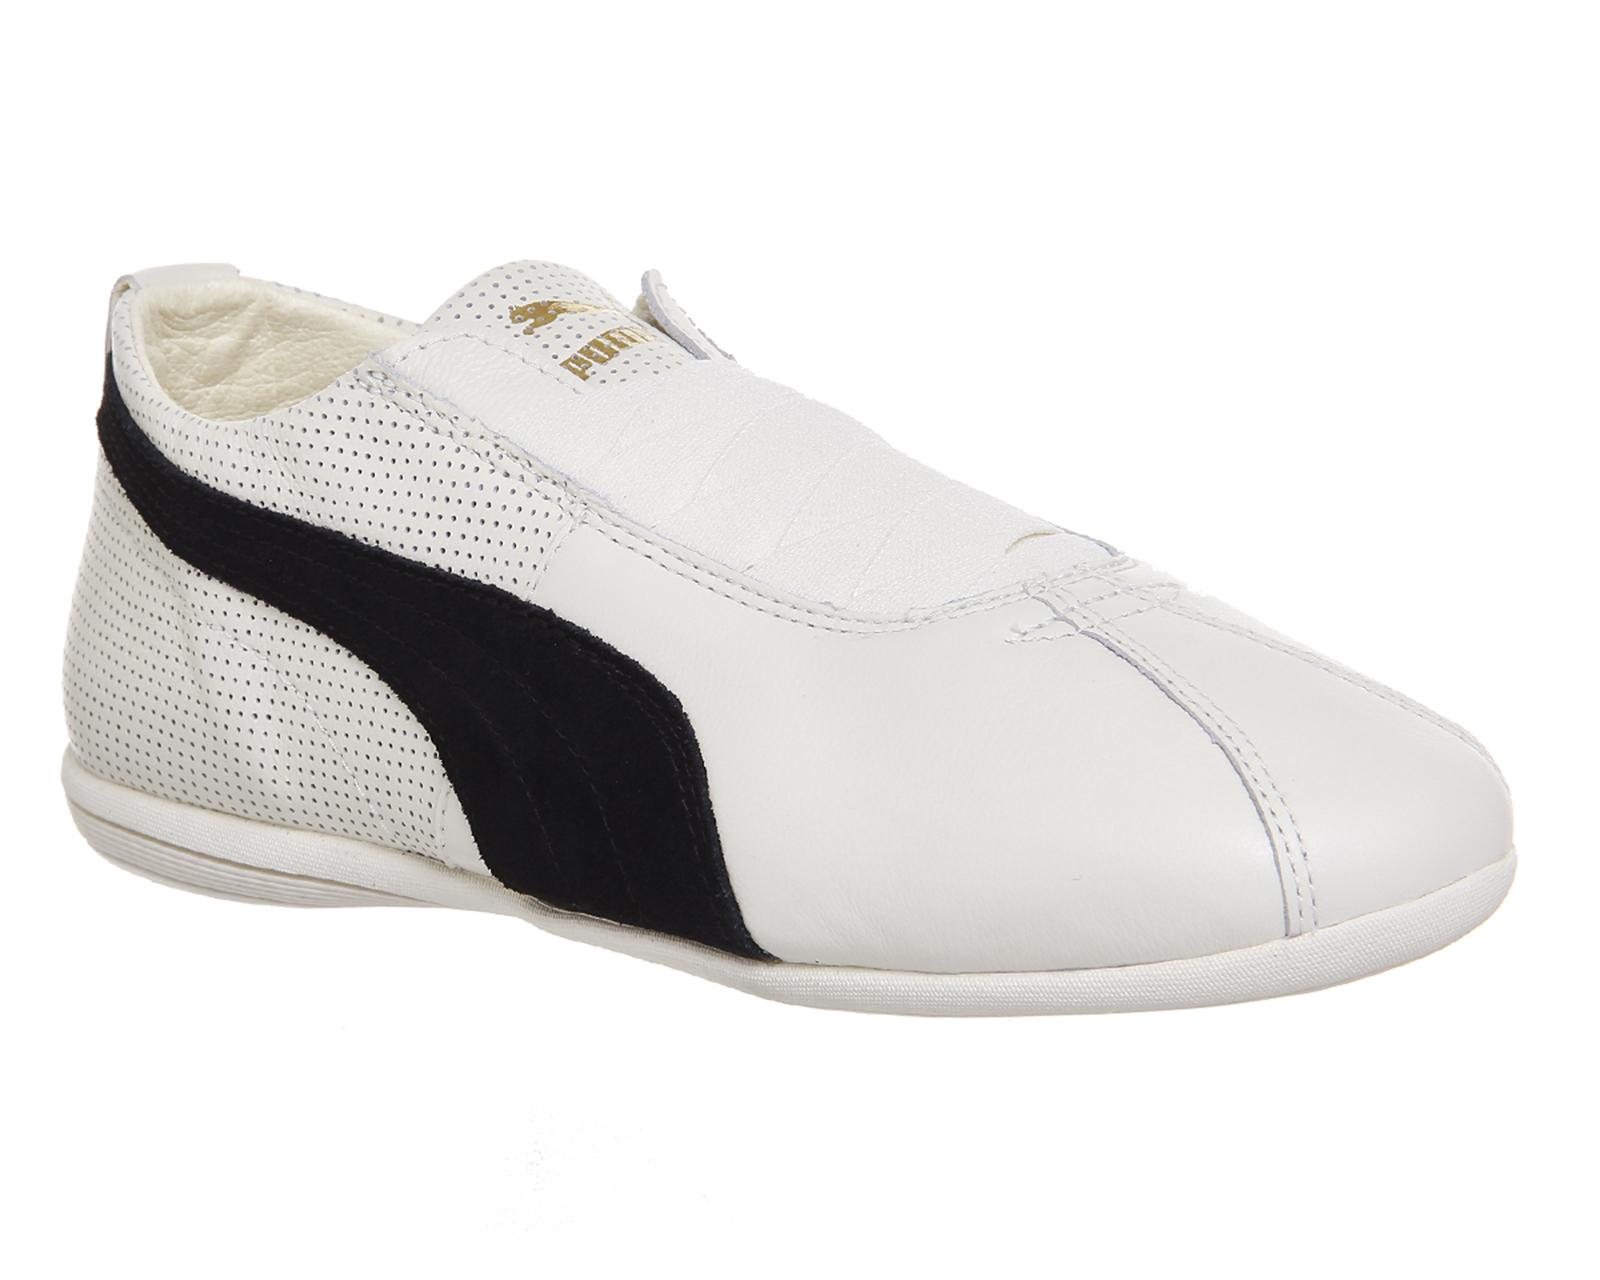 PUMA Eskiva Low in White for Men - Lyst